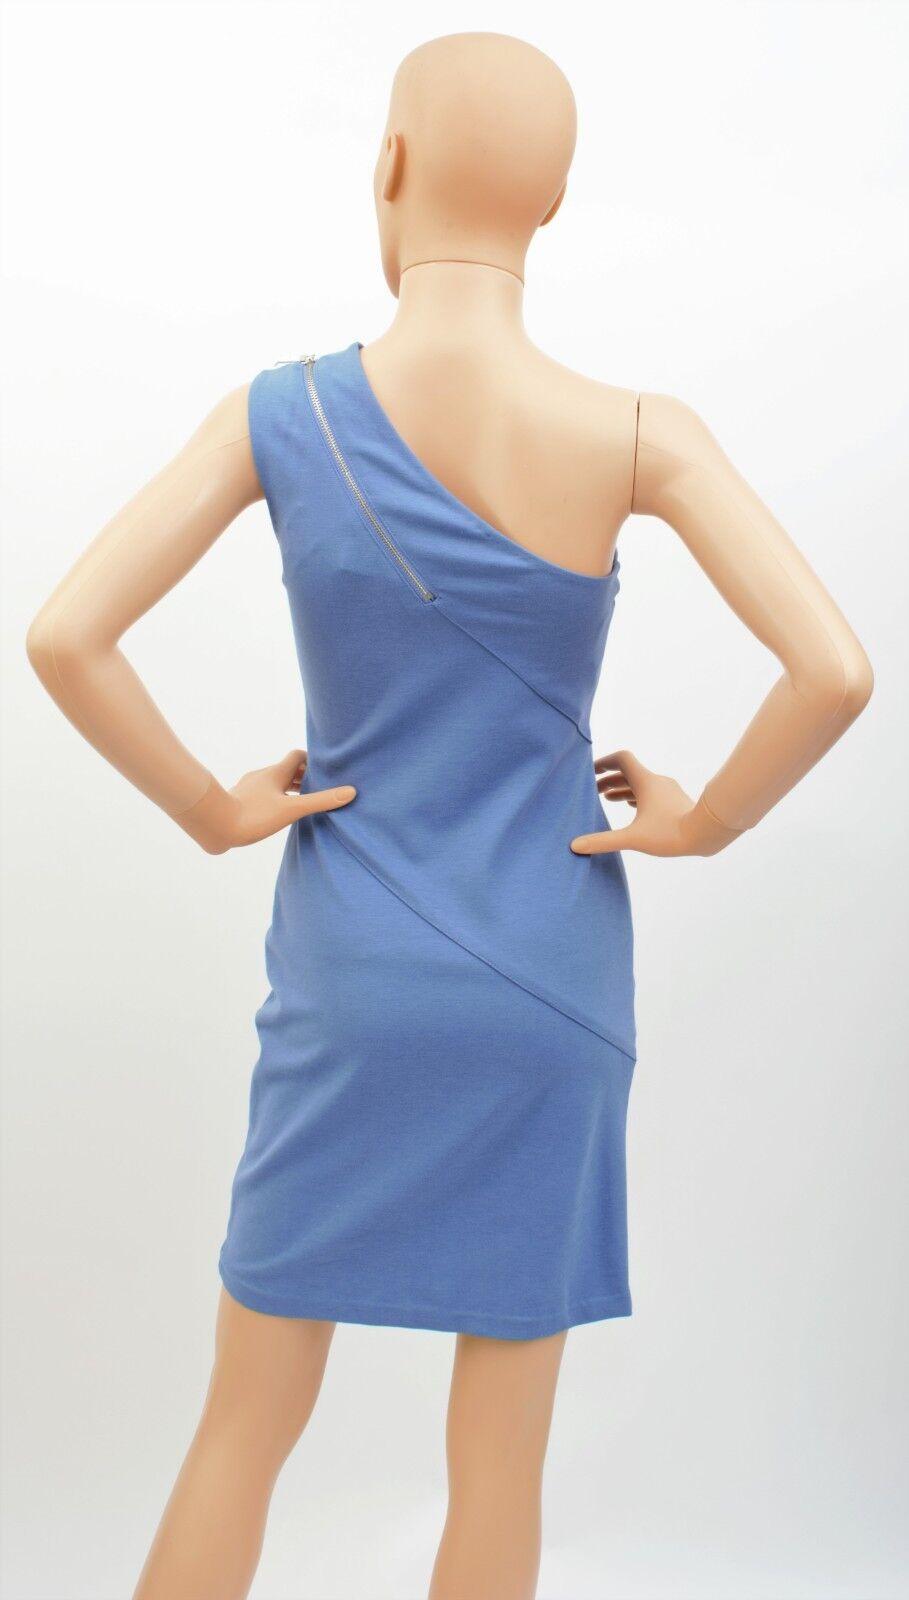 NWT WOMEN'S HALSTON HERITAGE ONE SHOULDER SHOULDER SHOULDER GALAXY (blueE) ZIP SHIFT DRESS - SIZE 0 66ba6f